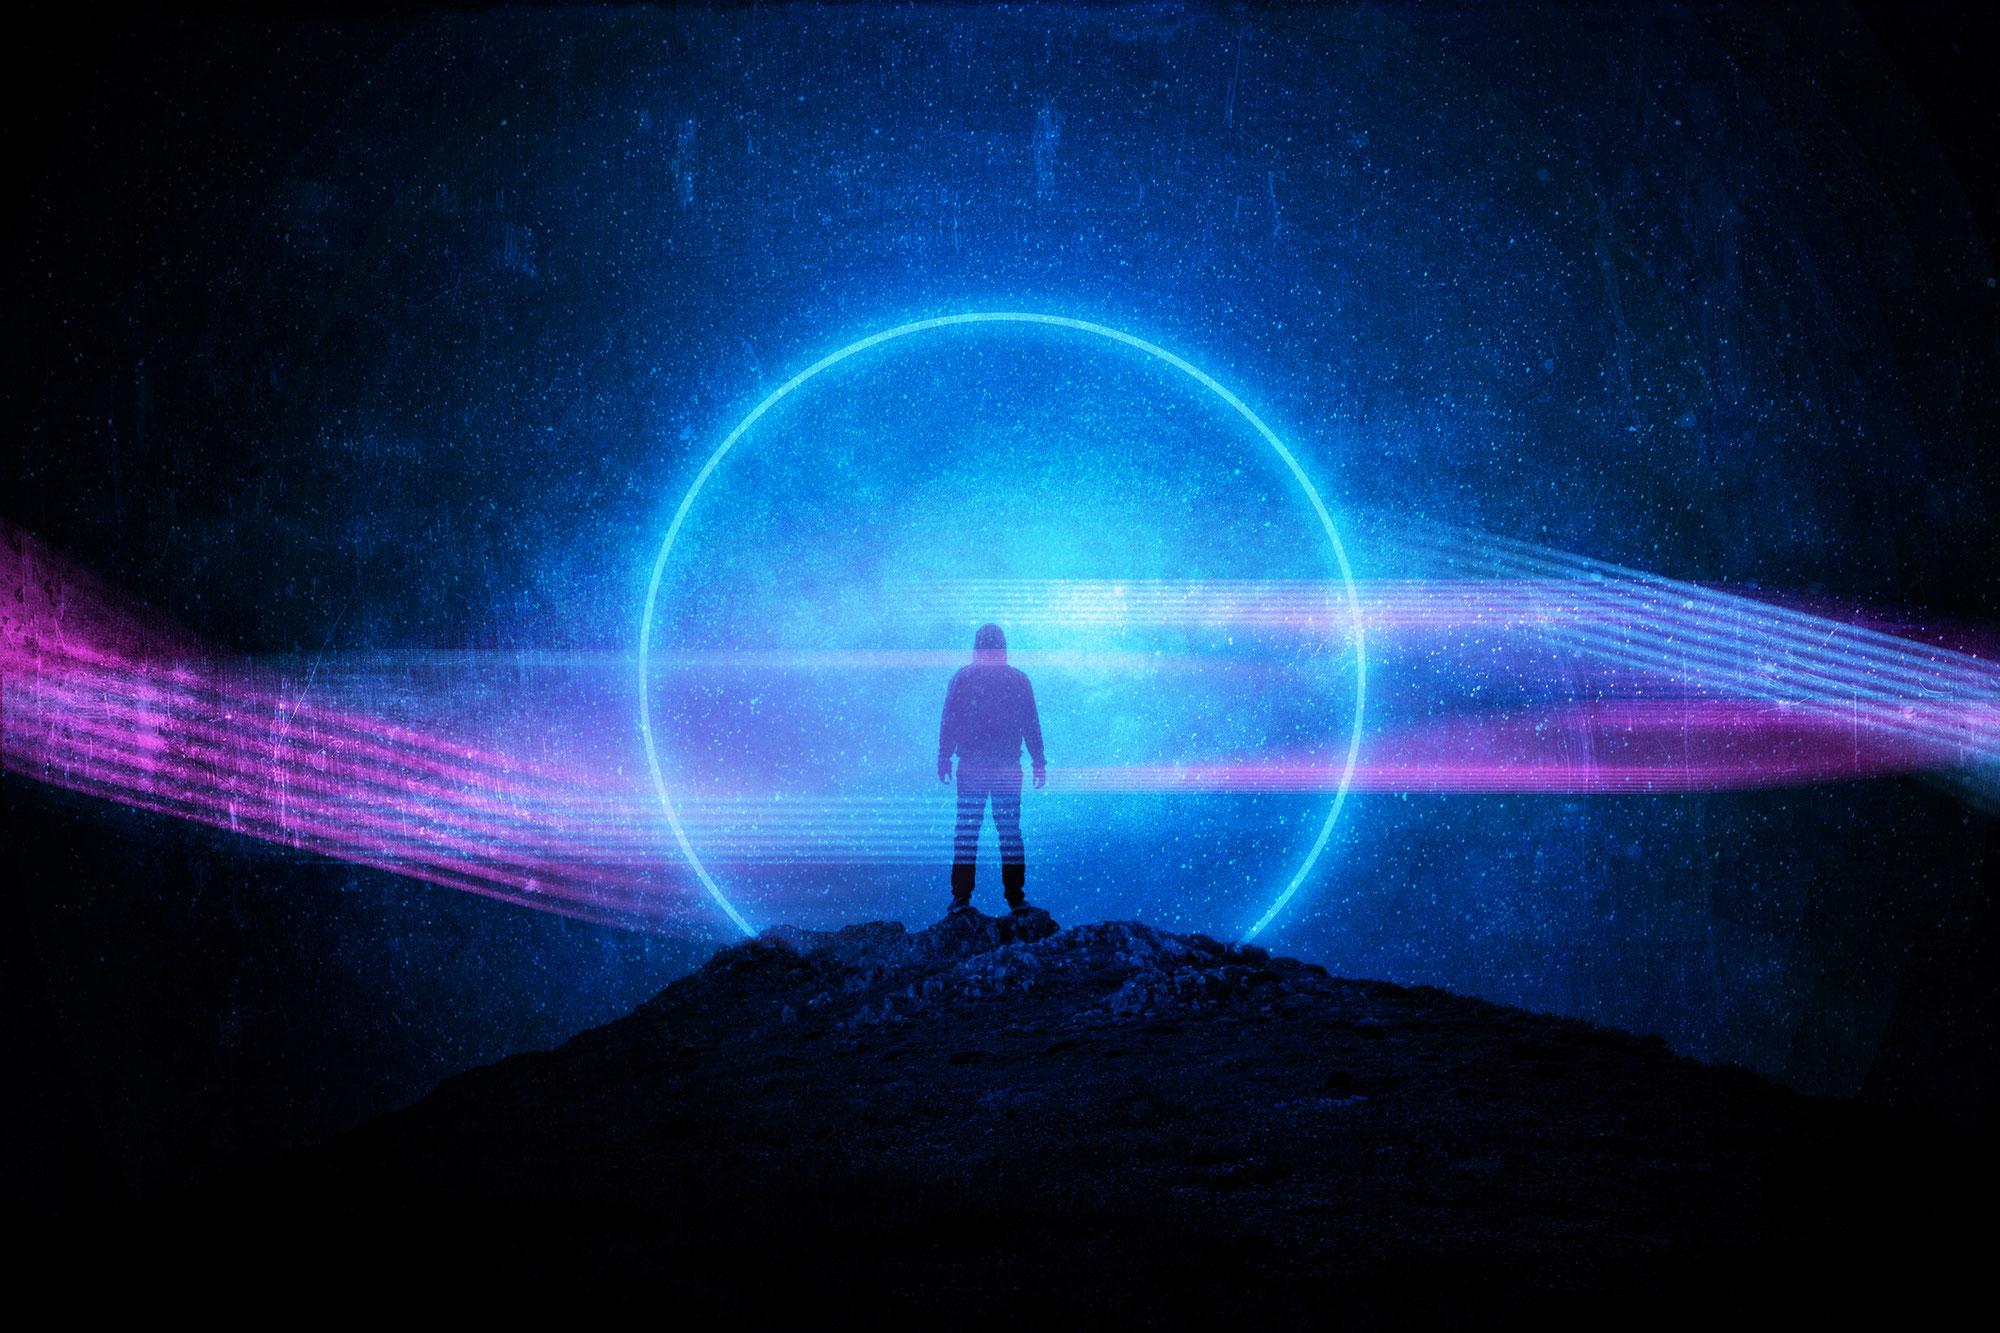 De non fysieke Blauwdruk van jullie realiteit ♥ Wieteke Koolhof ♥ Lichtwerkers Nederland